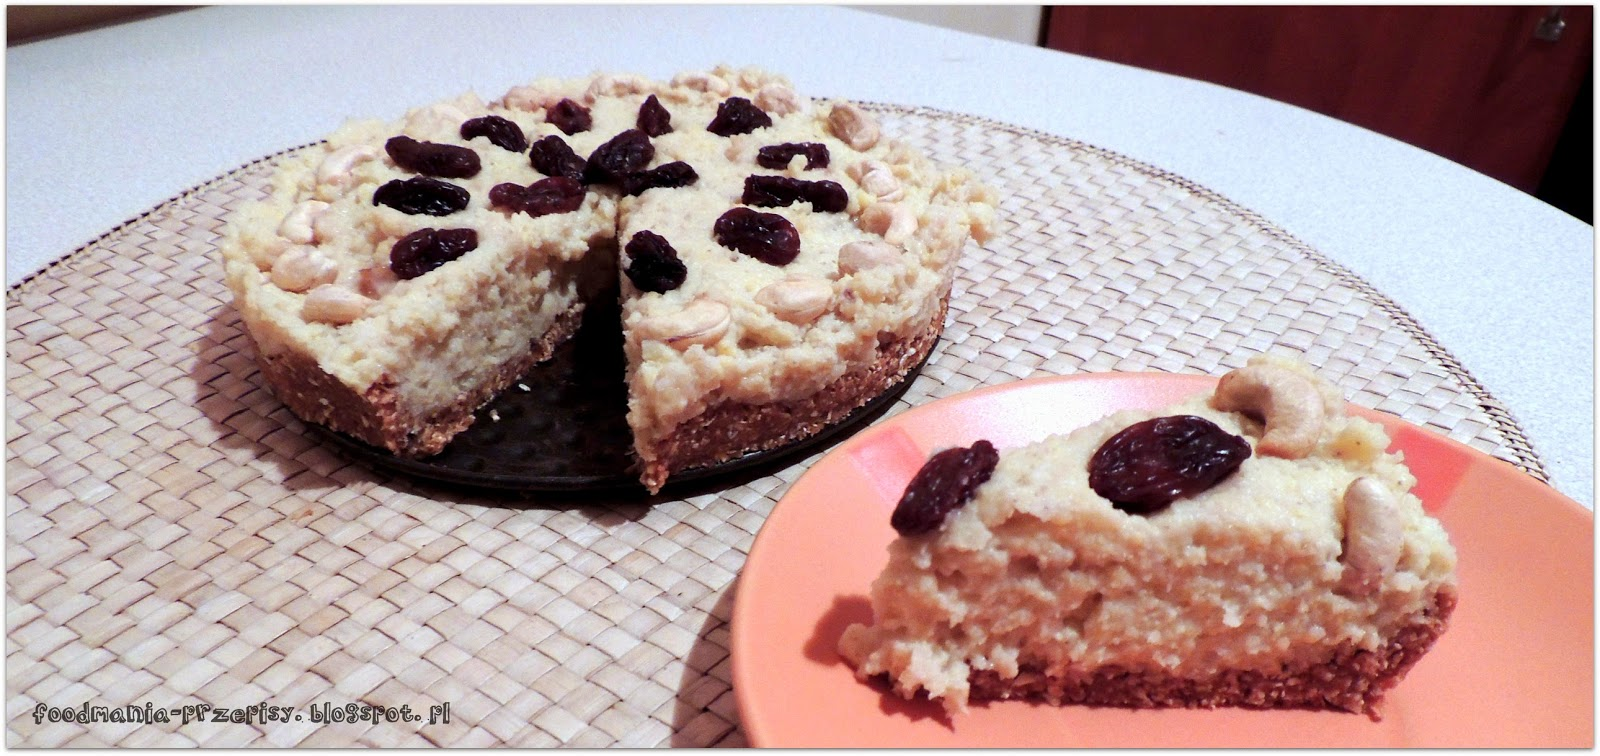 http://foodmania-przepisy.blogspot.com/2014/02/tarta-torcik-owsiano-daktylowa-z-kremem.html